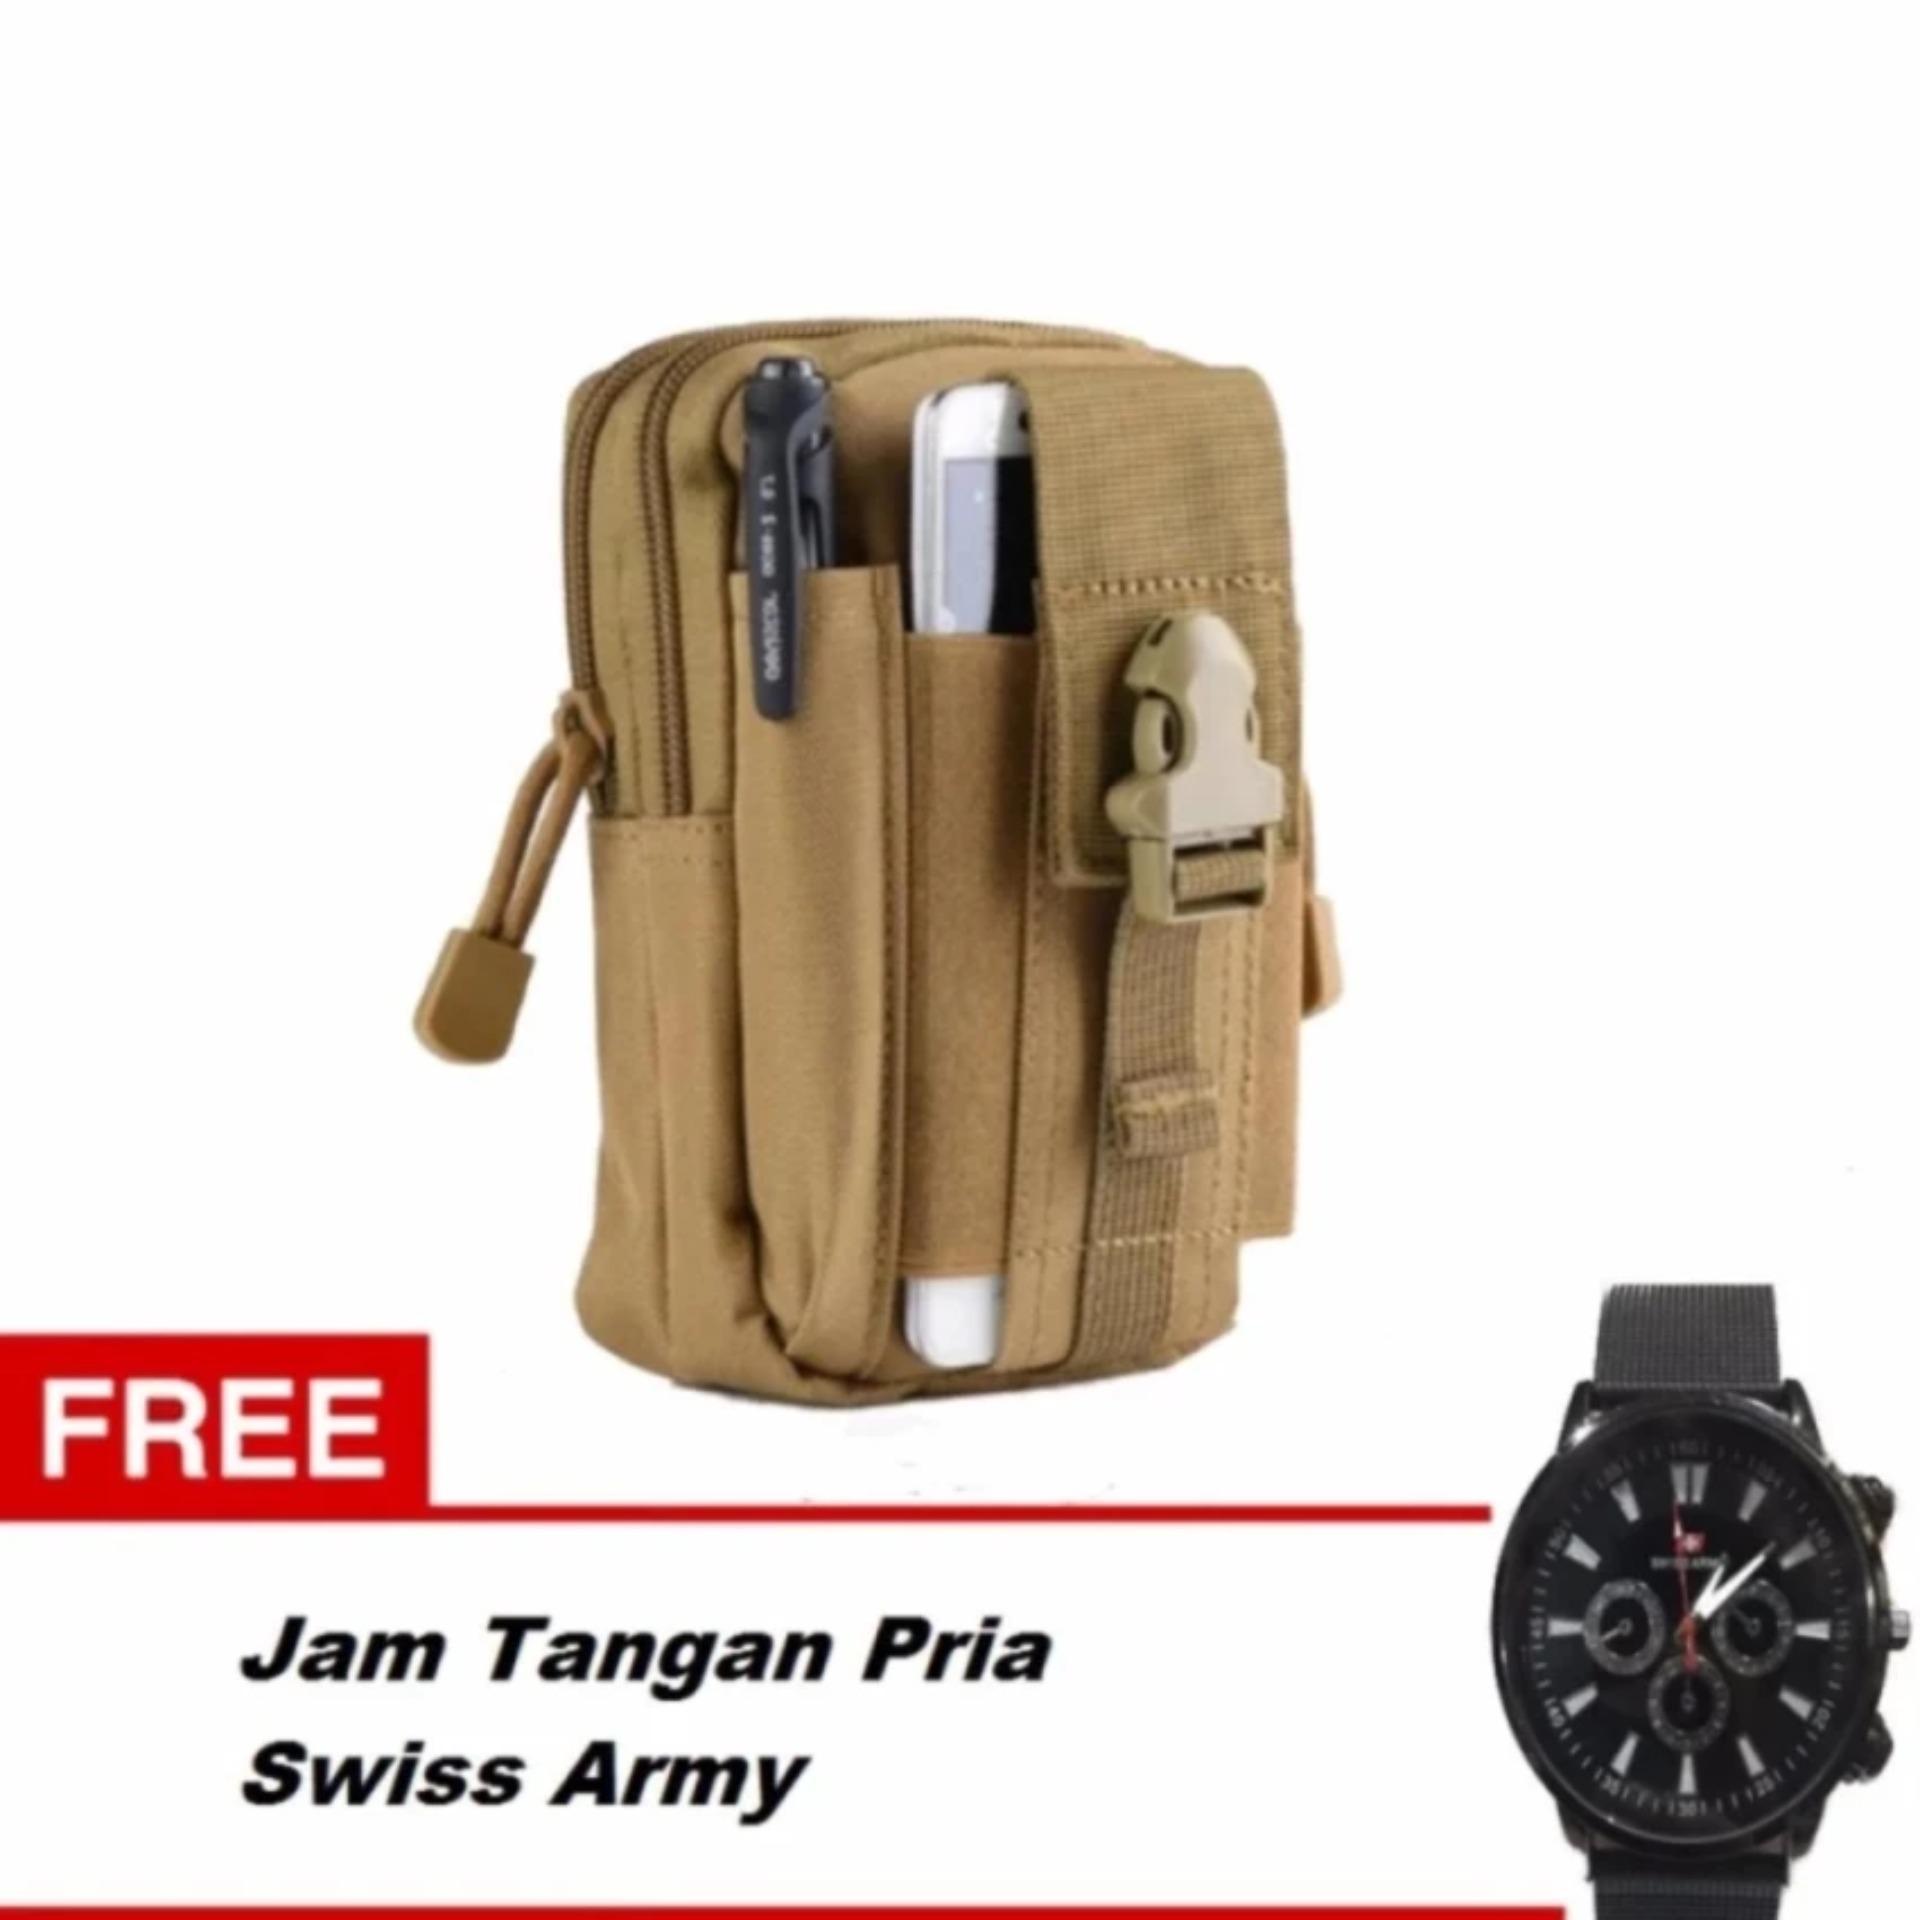 Harga Tas Pinggang Pria Army Tactic Molle Waist Small Bag Military Army Green Gratis Jam Tangan Pria Swiss Army Dki Jakarta